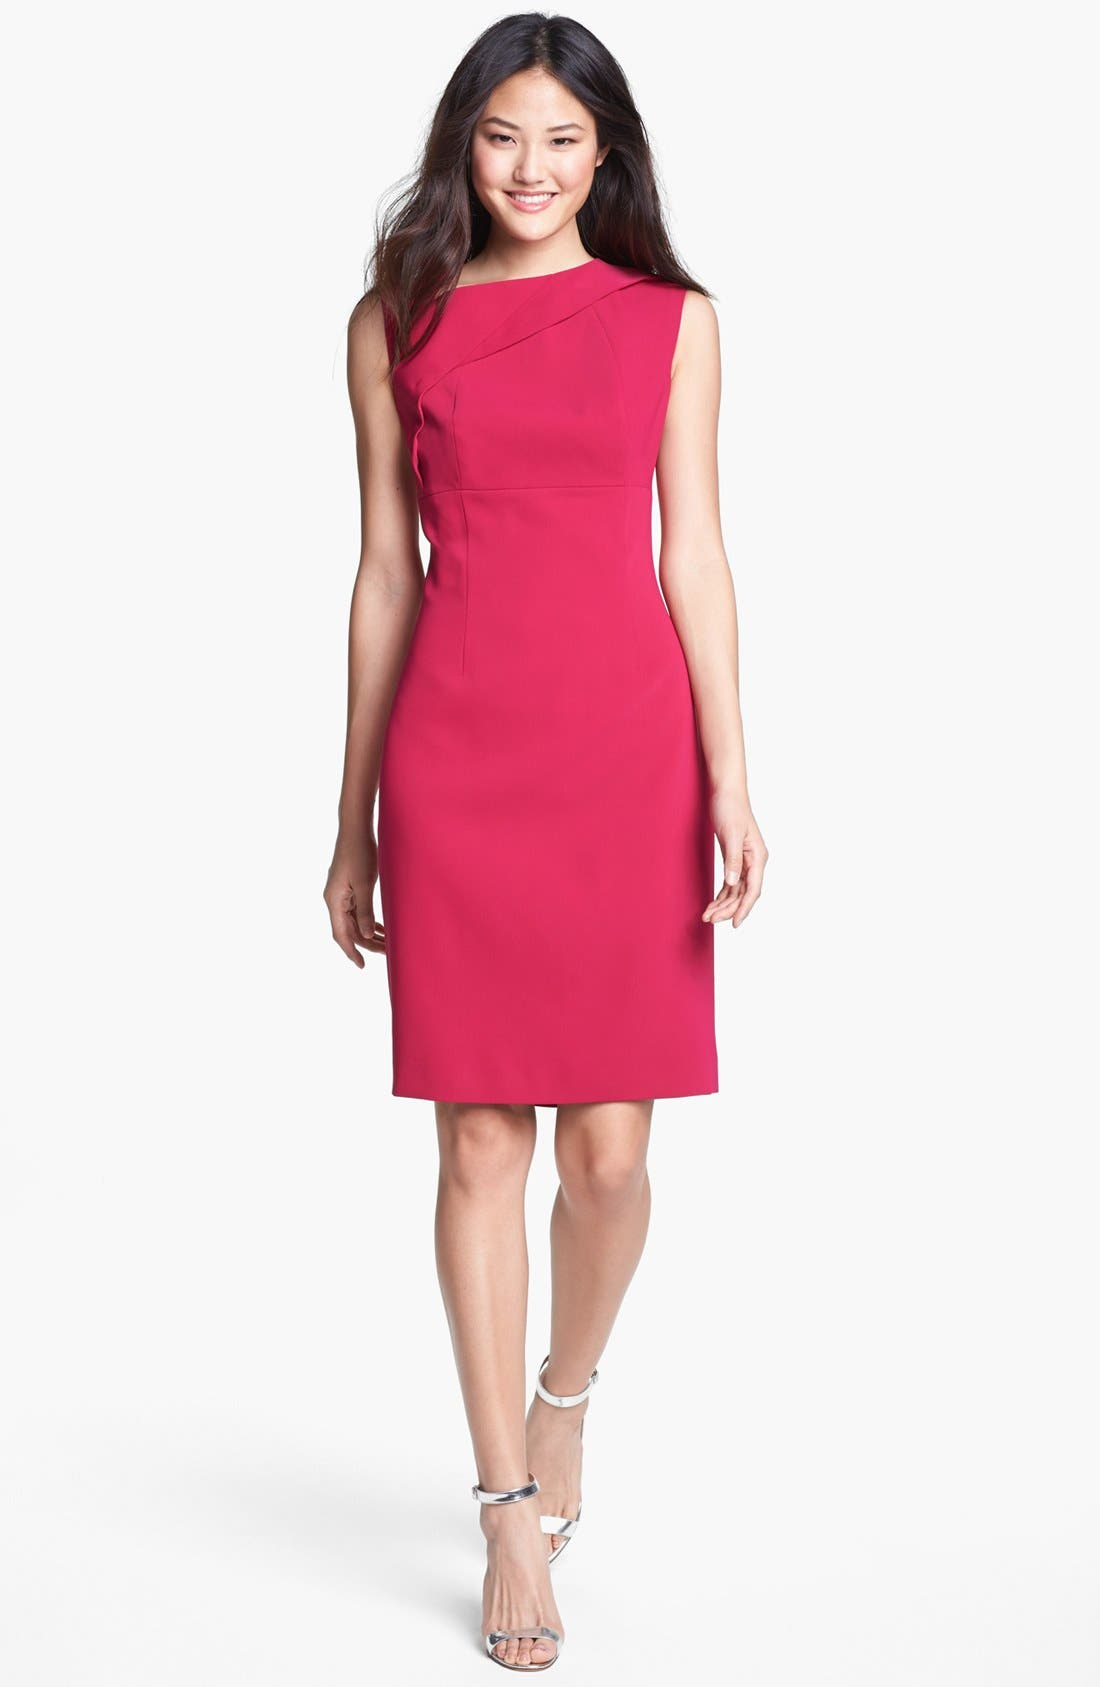 Alternate Image 1 Selected - T Tahari 'Persia' Sheath Dress